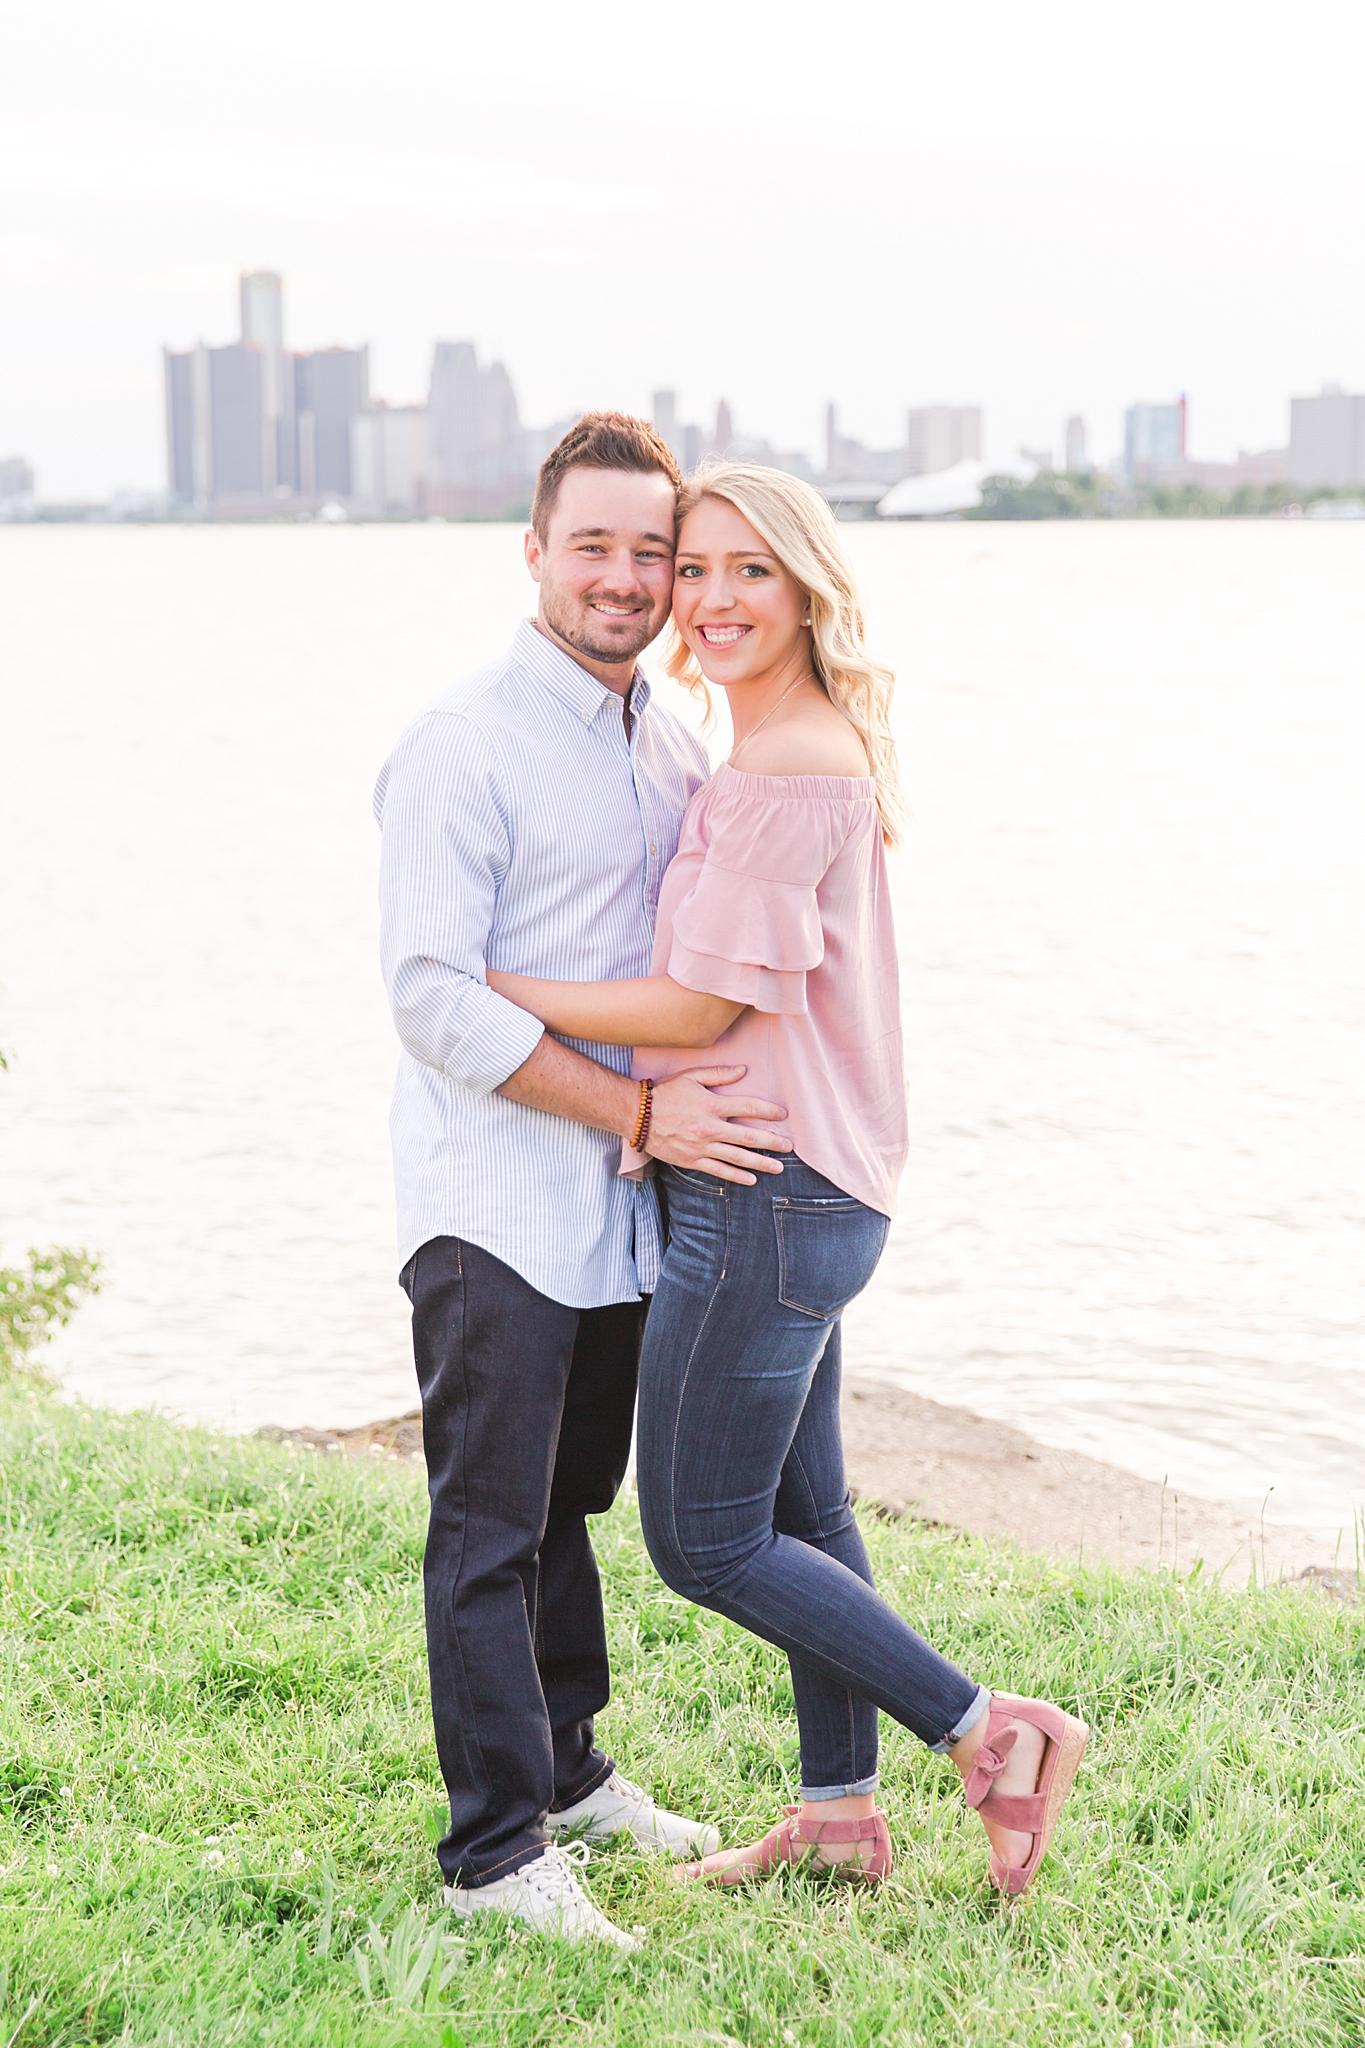 detroit-wedding-photographer-downtown-detroit-belle-isle-engagement-photos-sarah-eric-by-courtney-carolyn-photography_0044.jpg